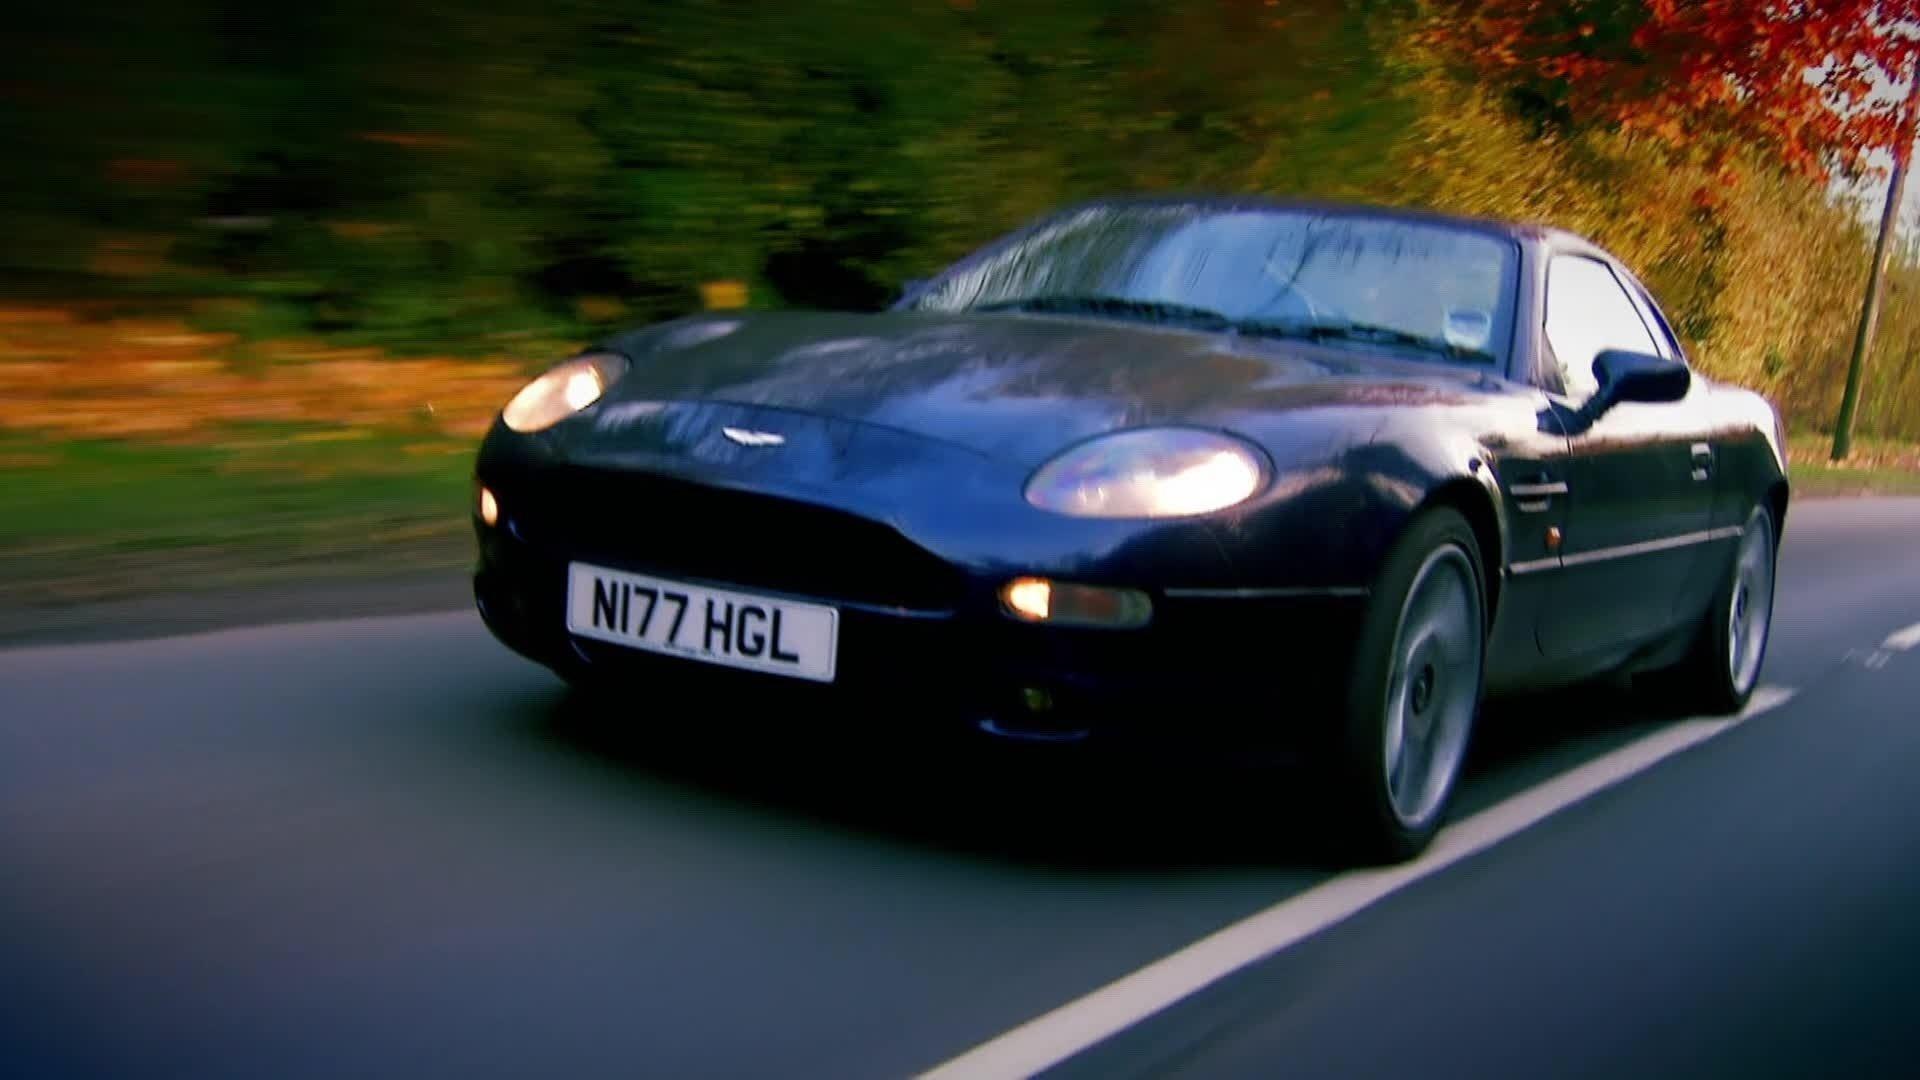 Wheeler Dealers 10 Episode 1 Aston Martin Db7 Motortrend